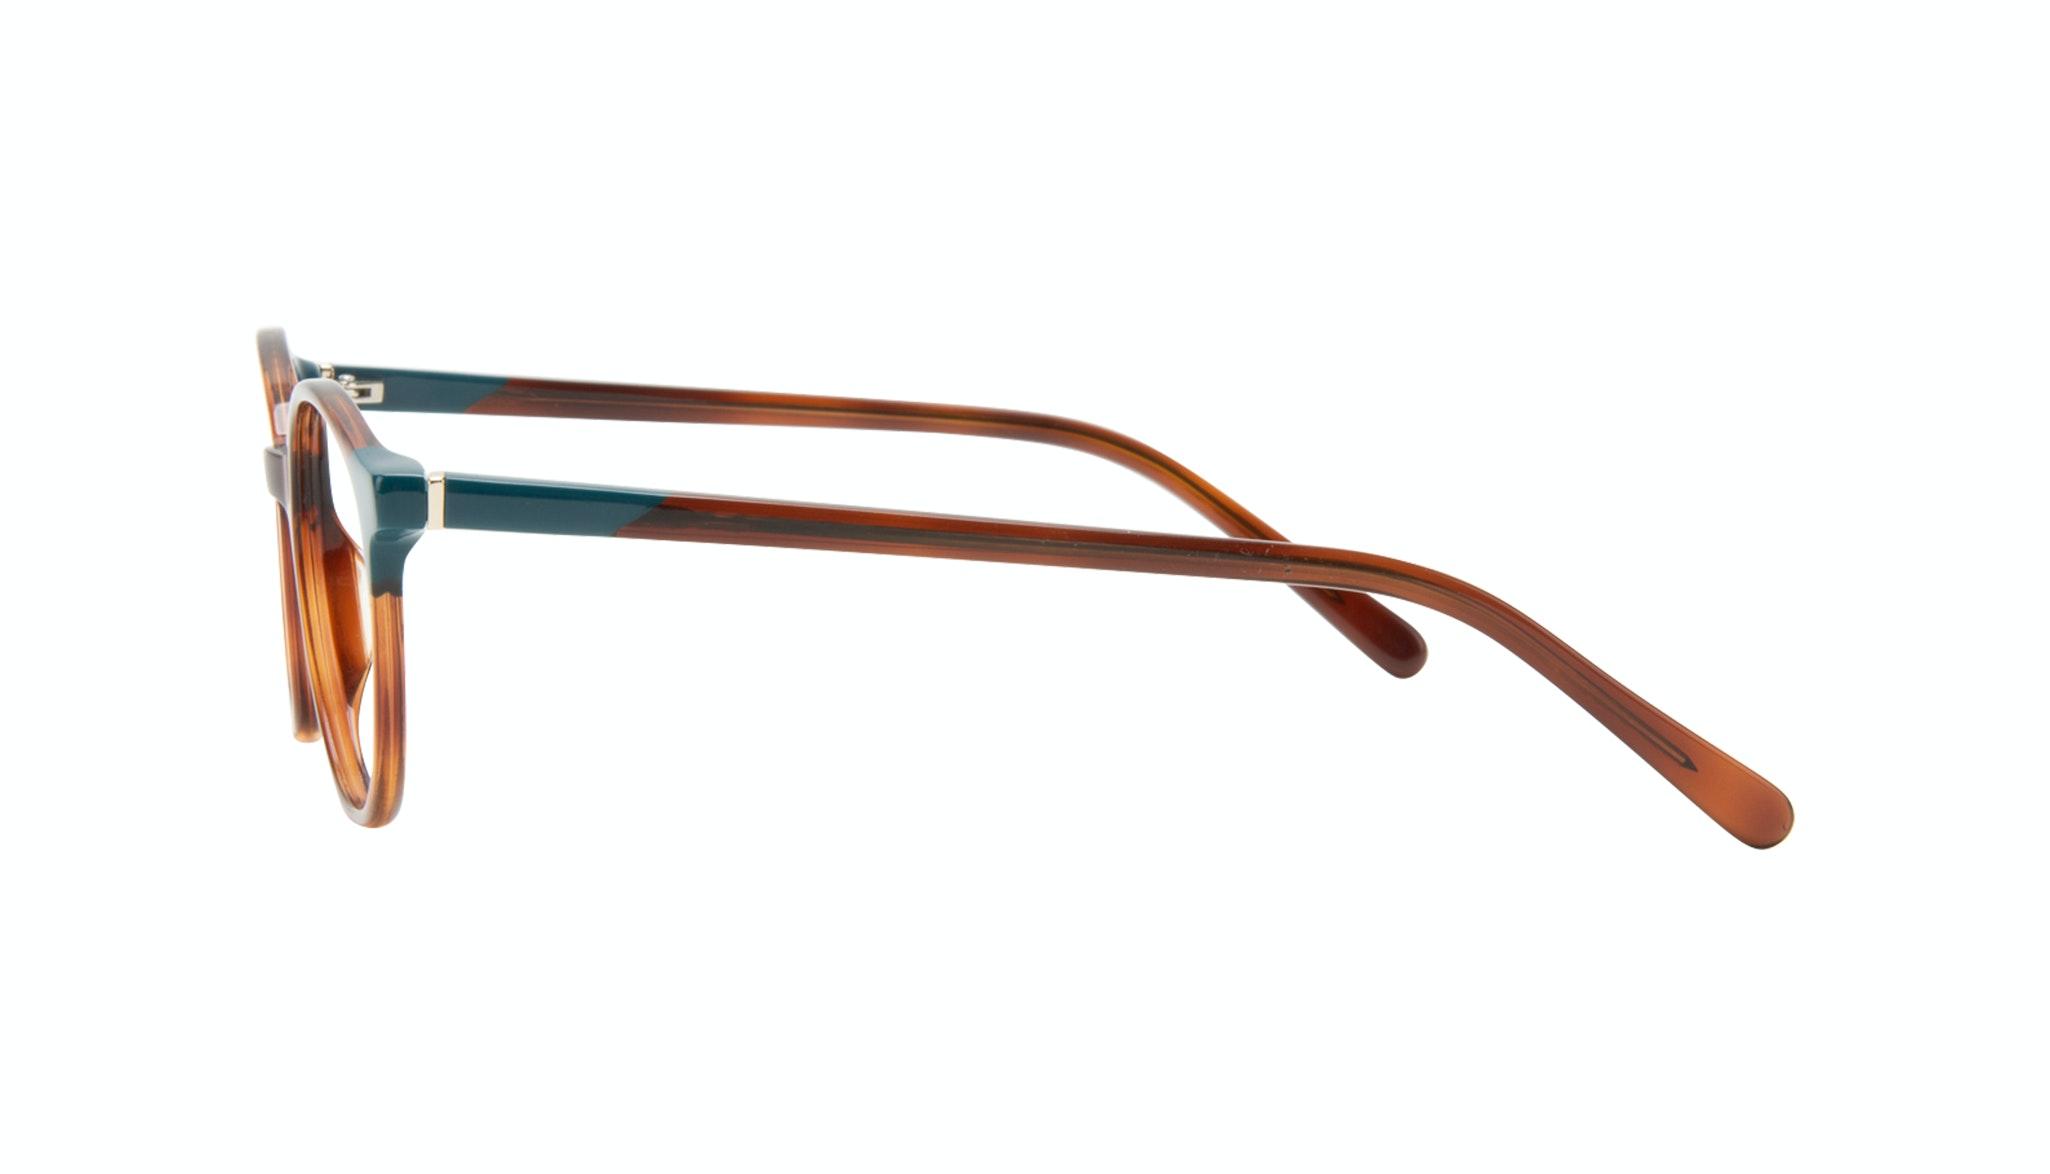 Affordable Fashion Glasses Round Eyeglasses Women Vivid Teal Tort Side